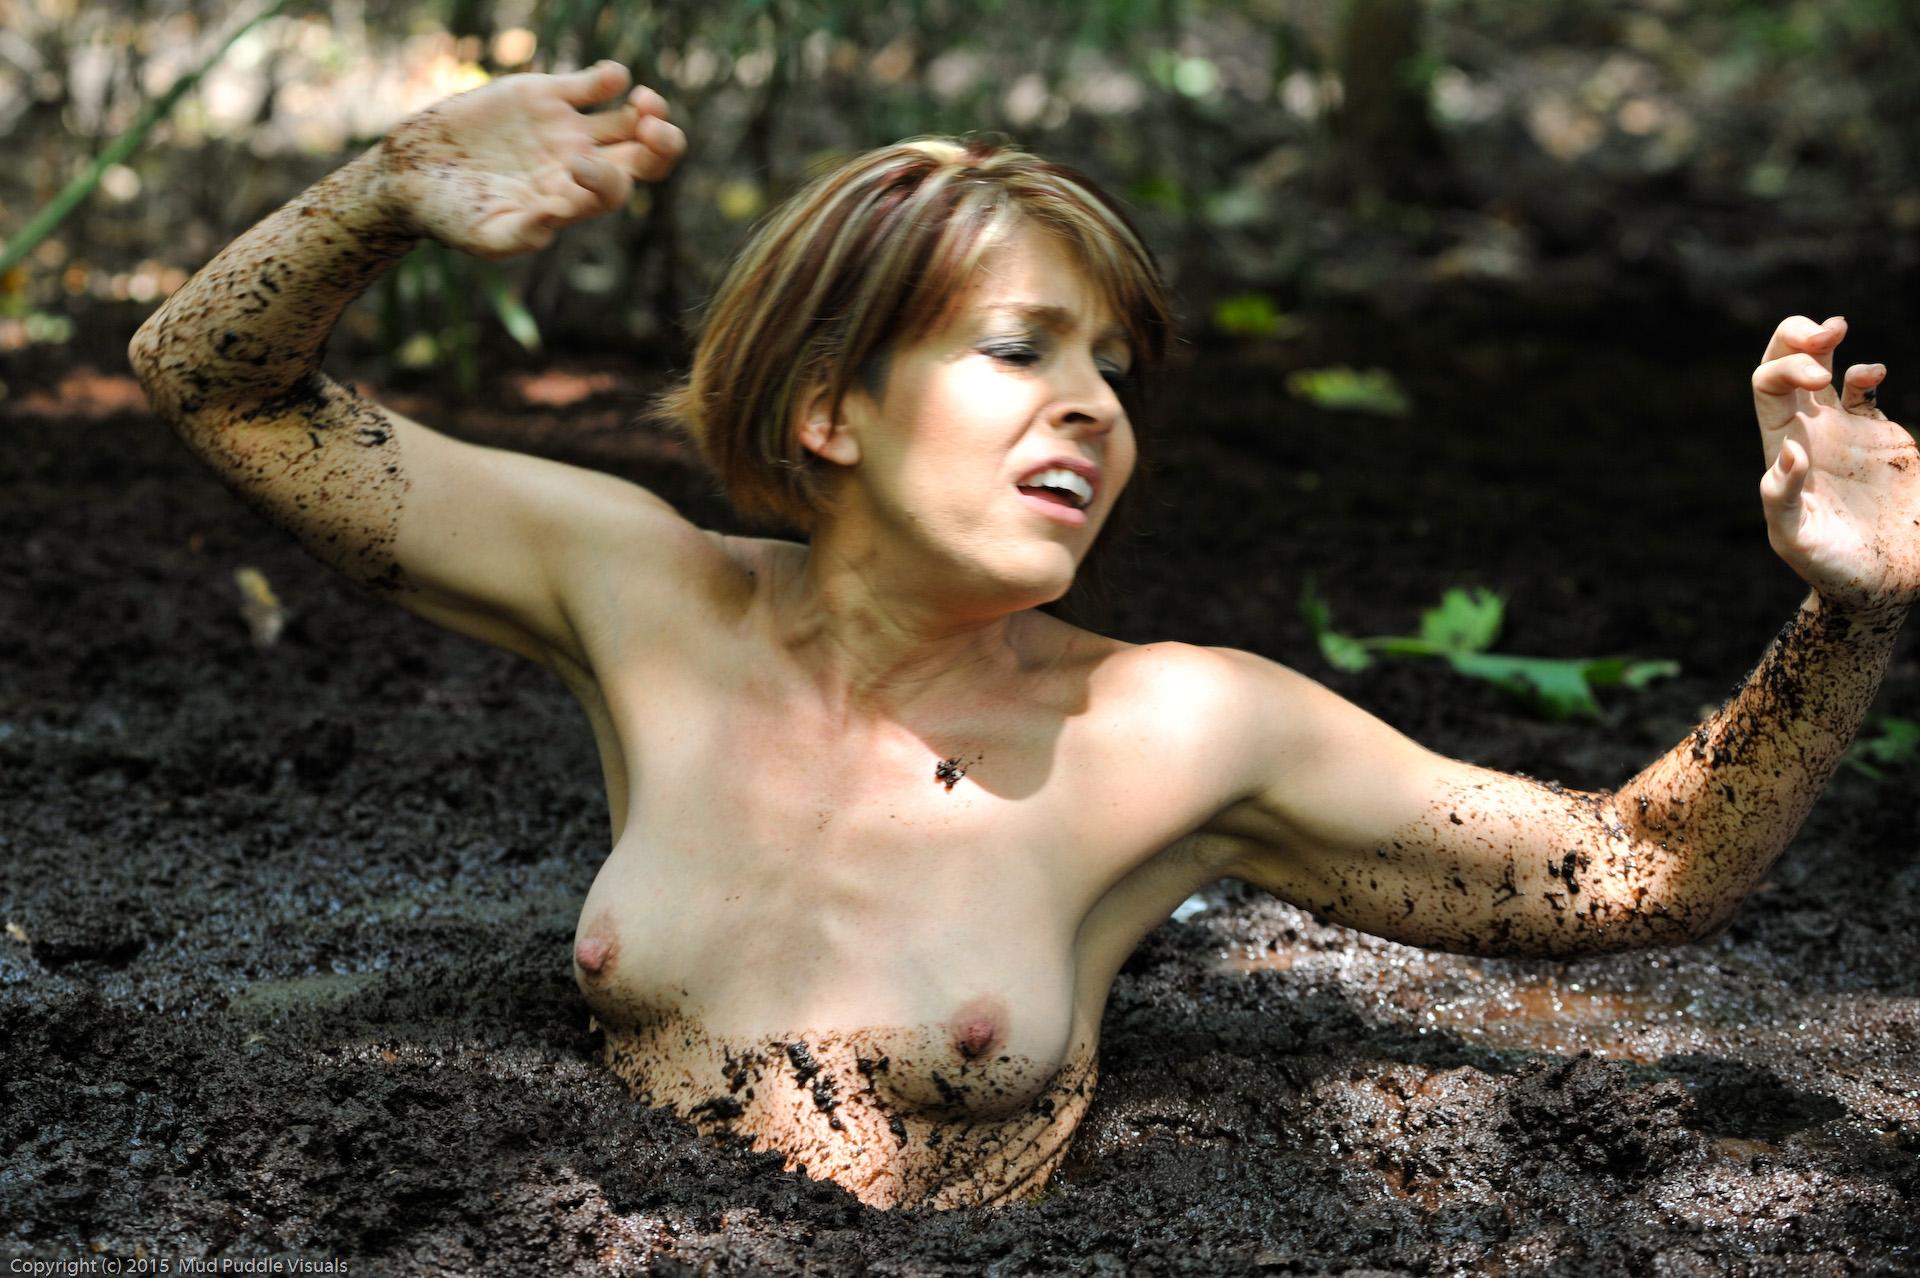 bangladesi naked girl naked photo download